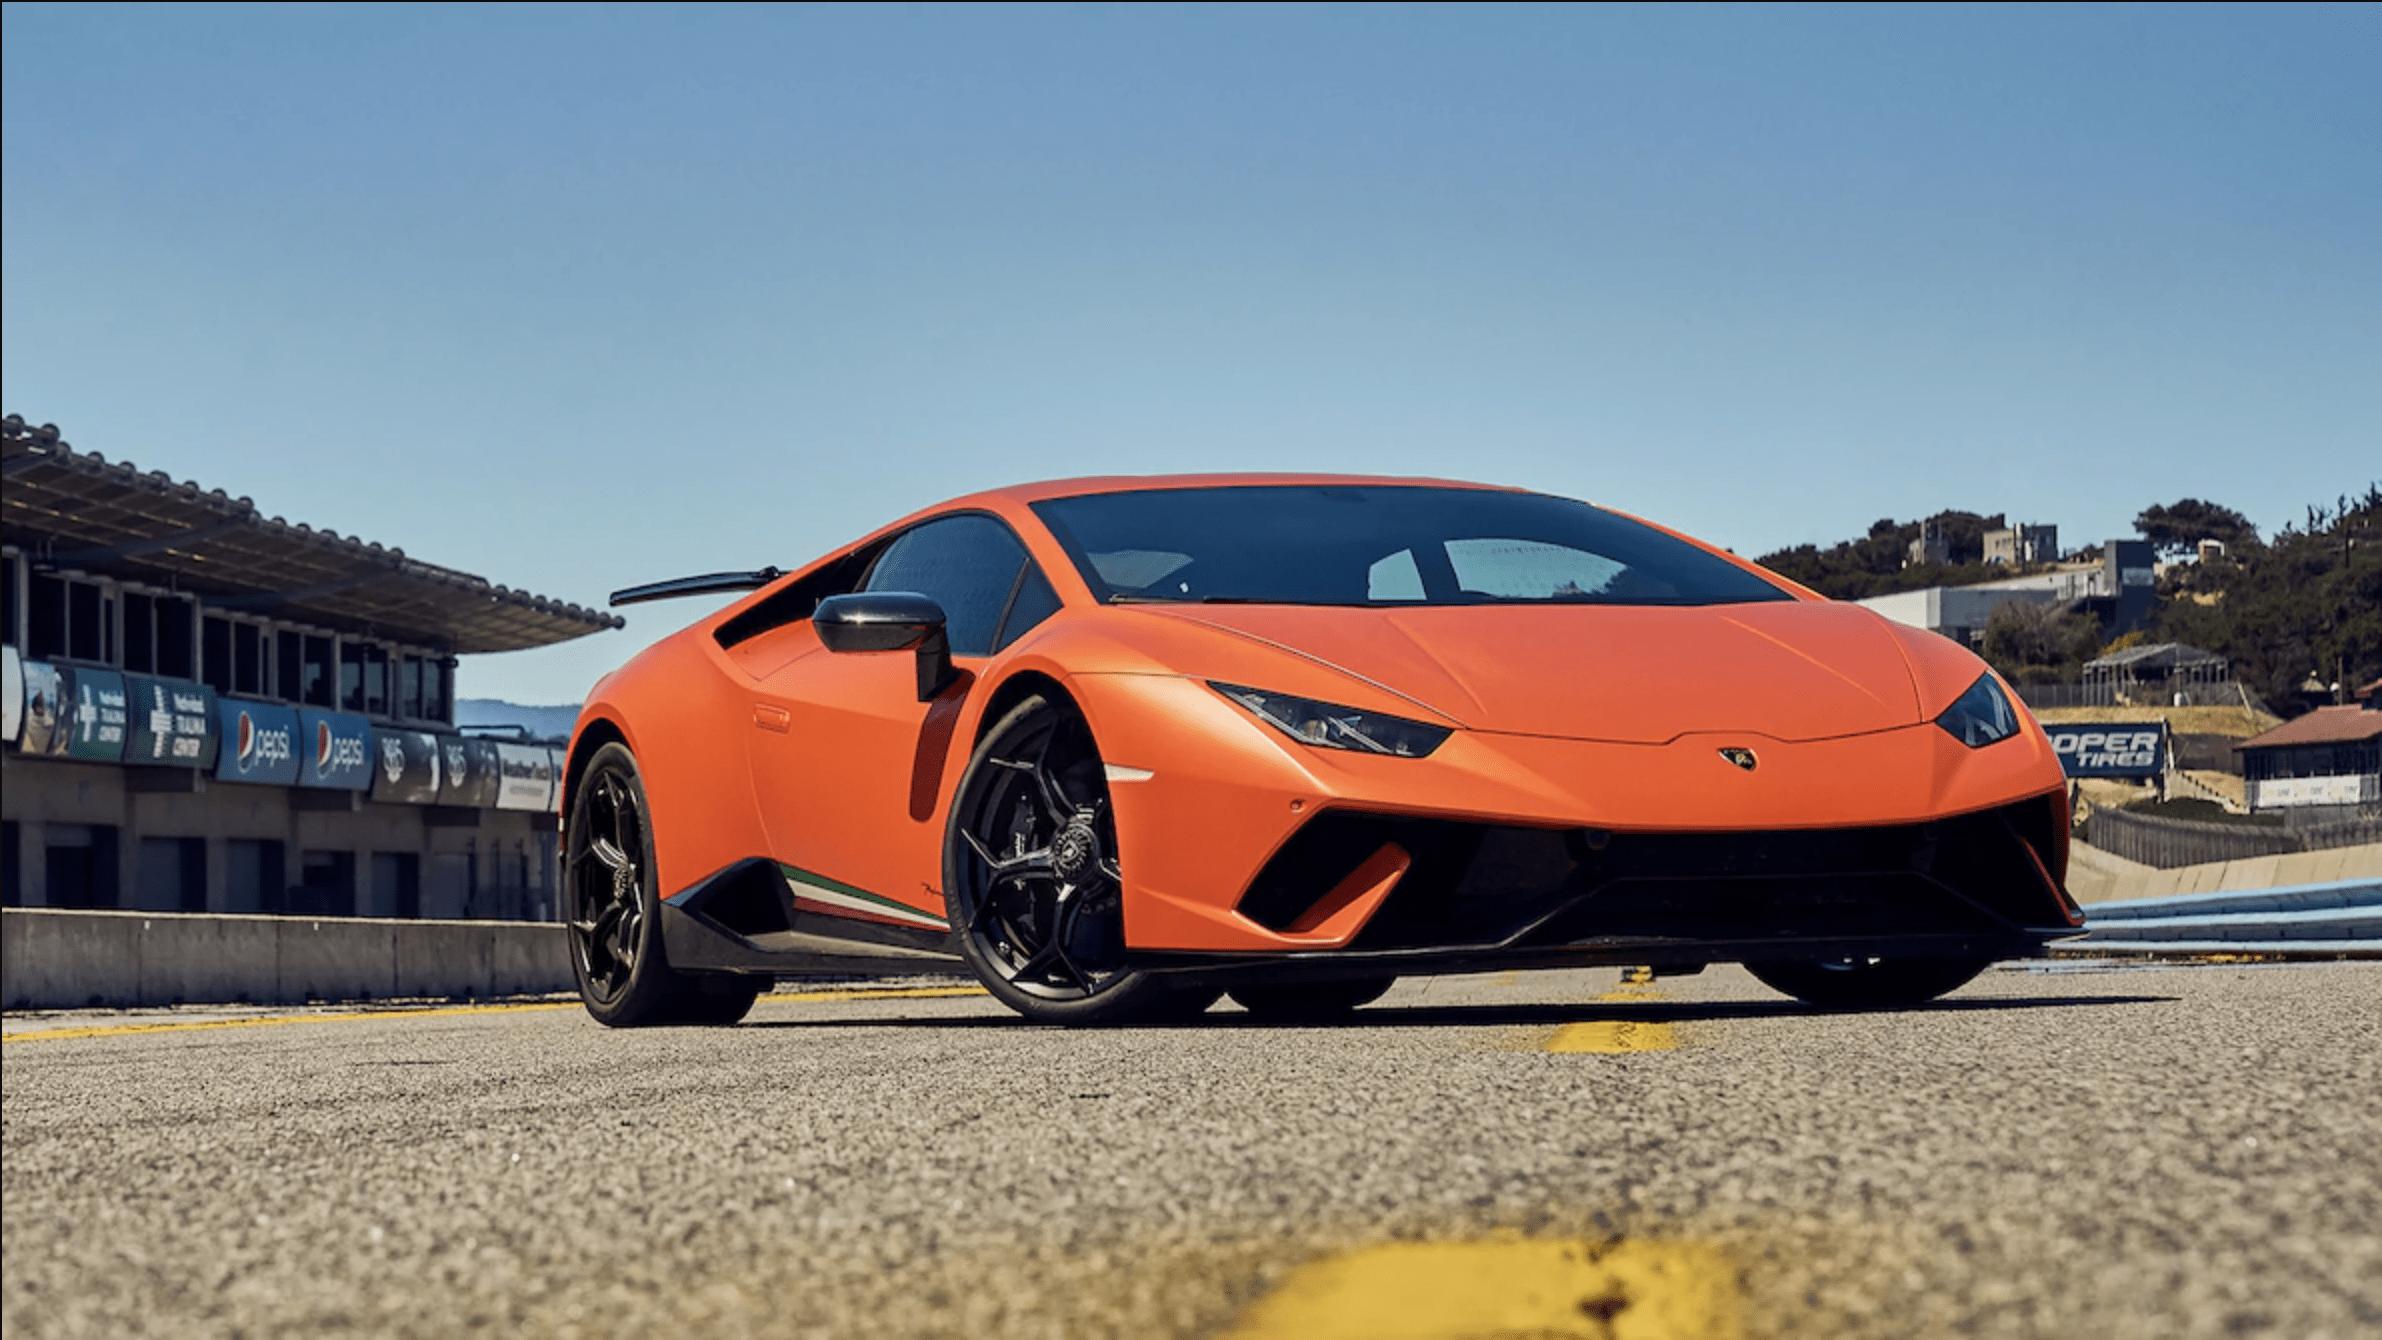 Lamborghini Huracan Performante Is The 2018 Motor Trend Best